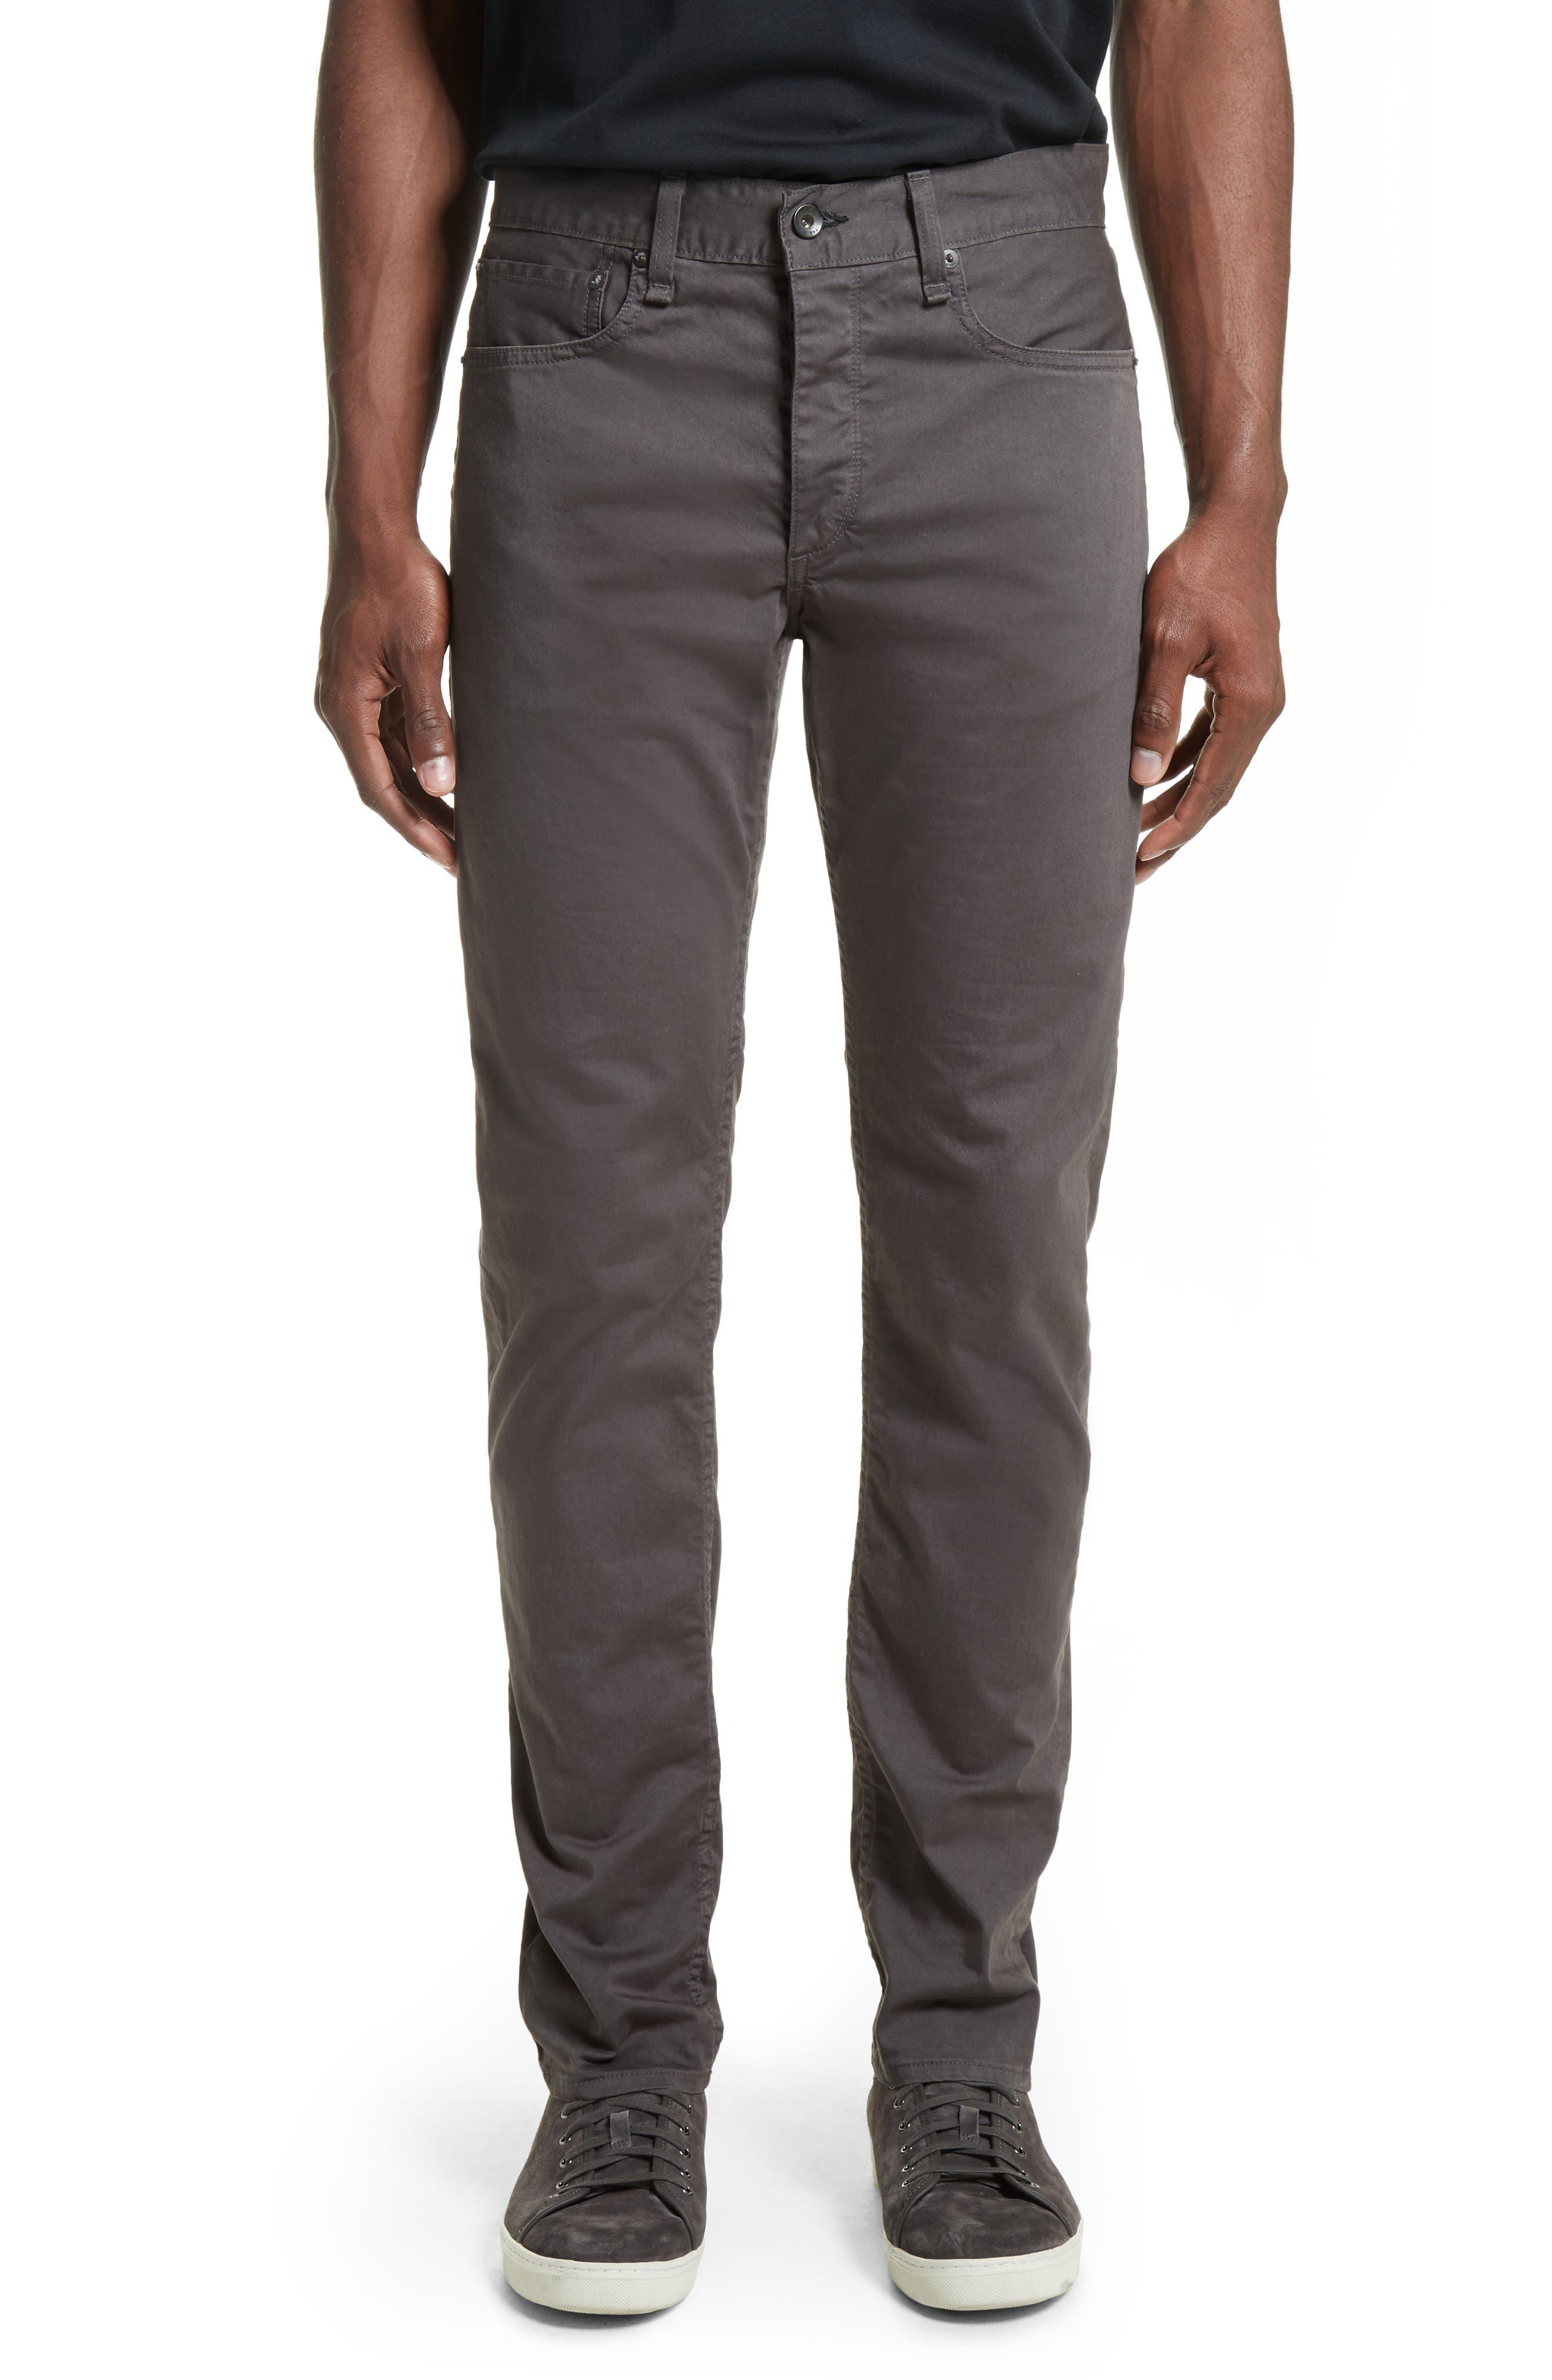 Fit 2 Slim Five-Pocket Pants,                         Main,                         color, Grey